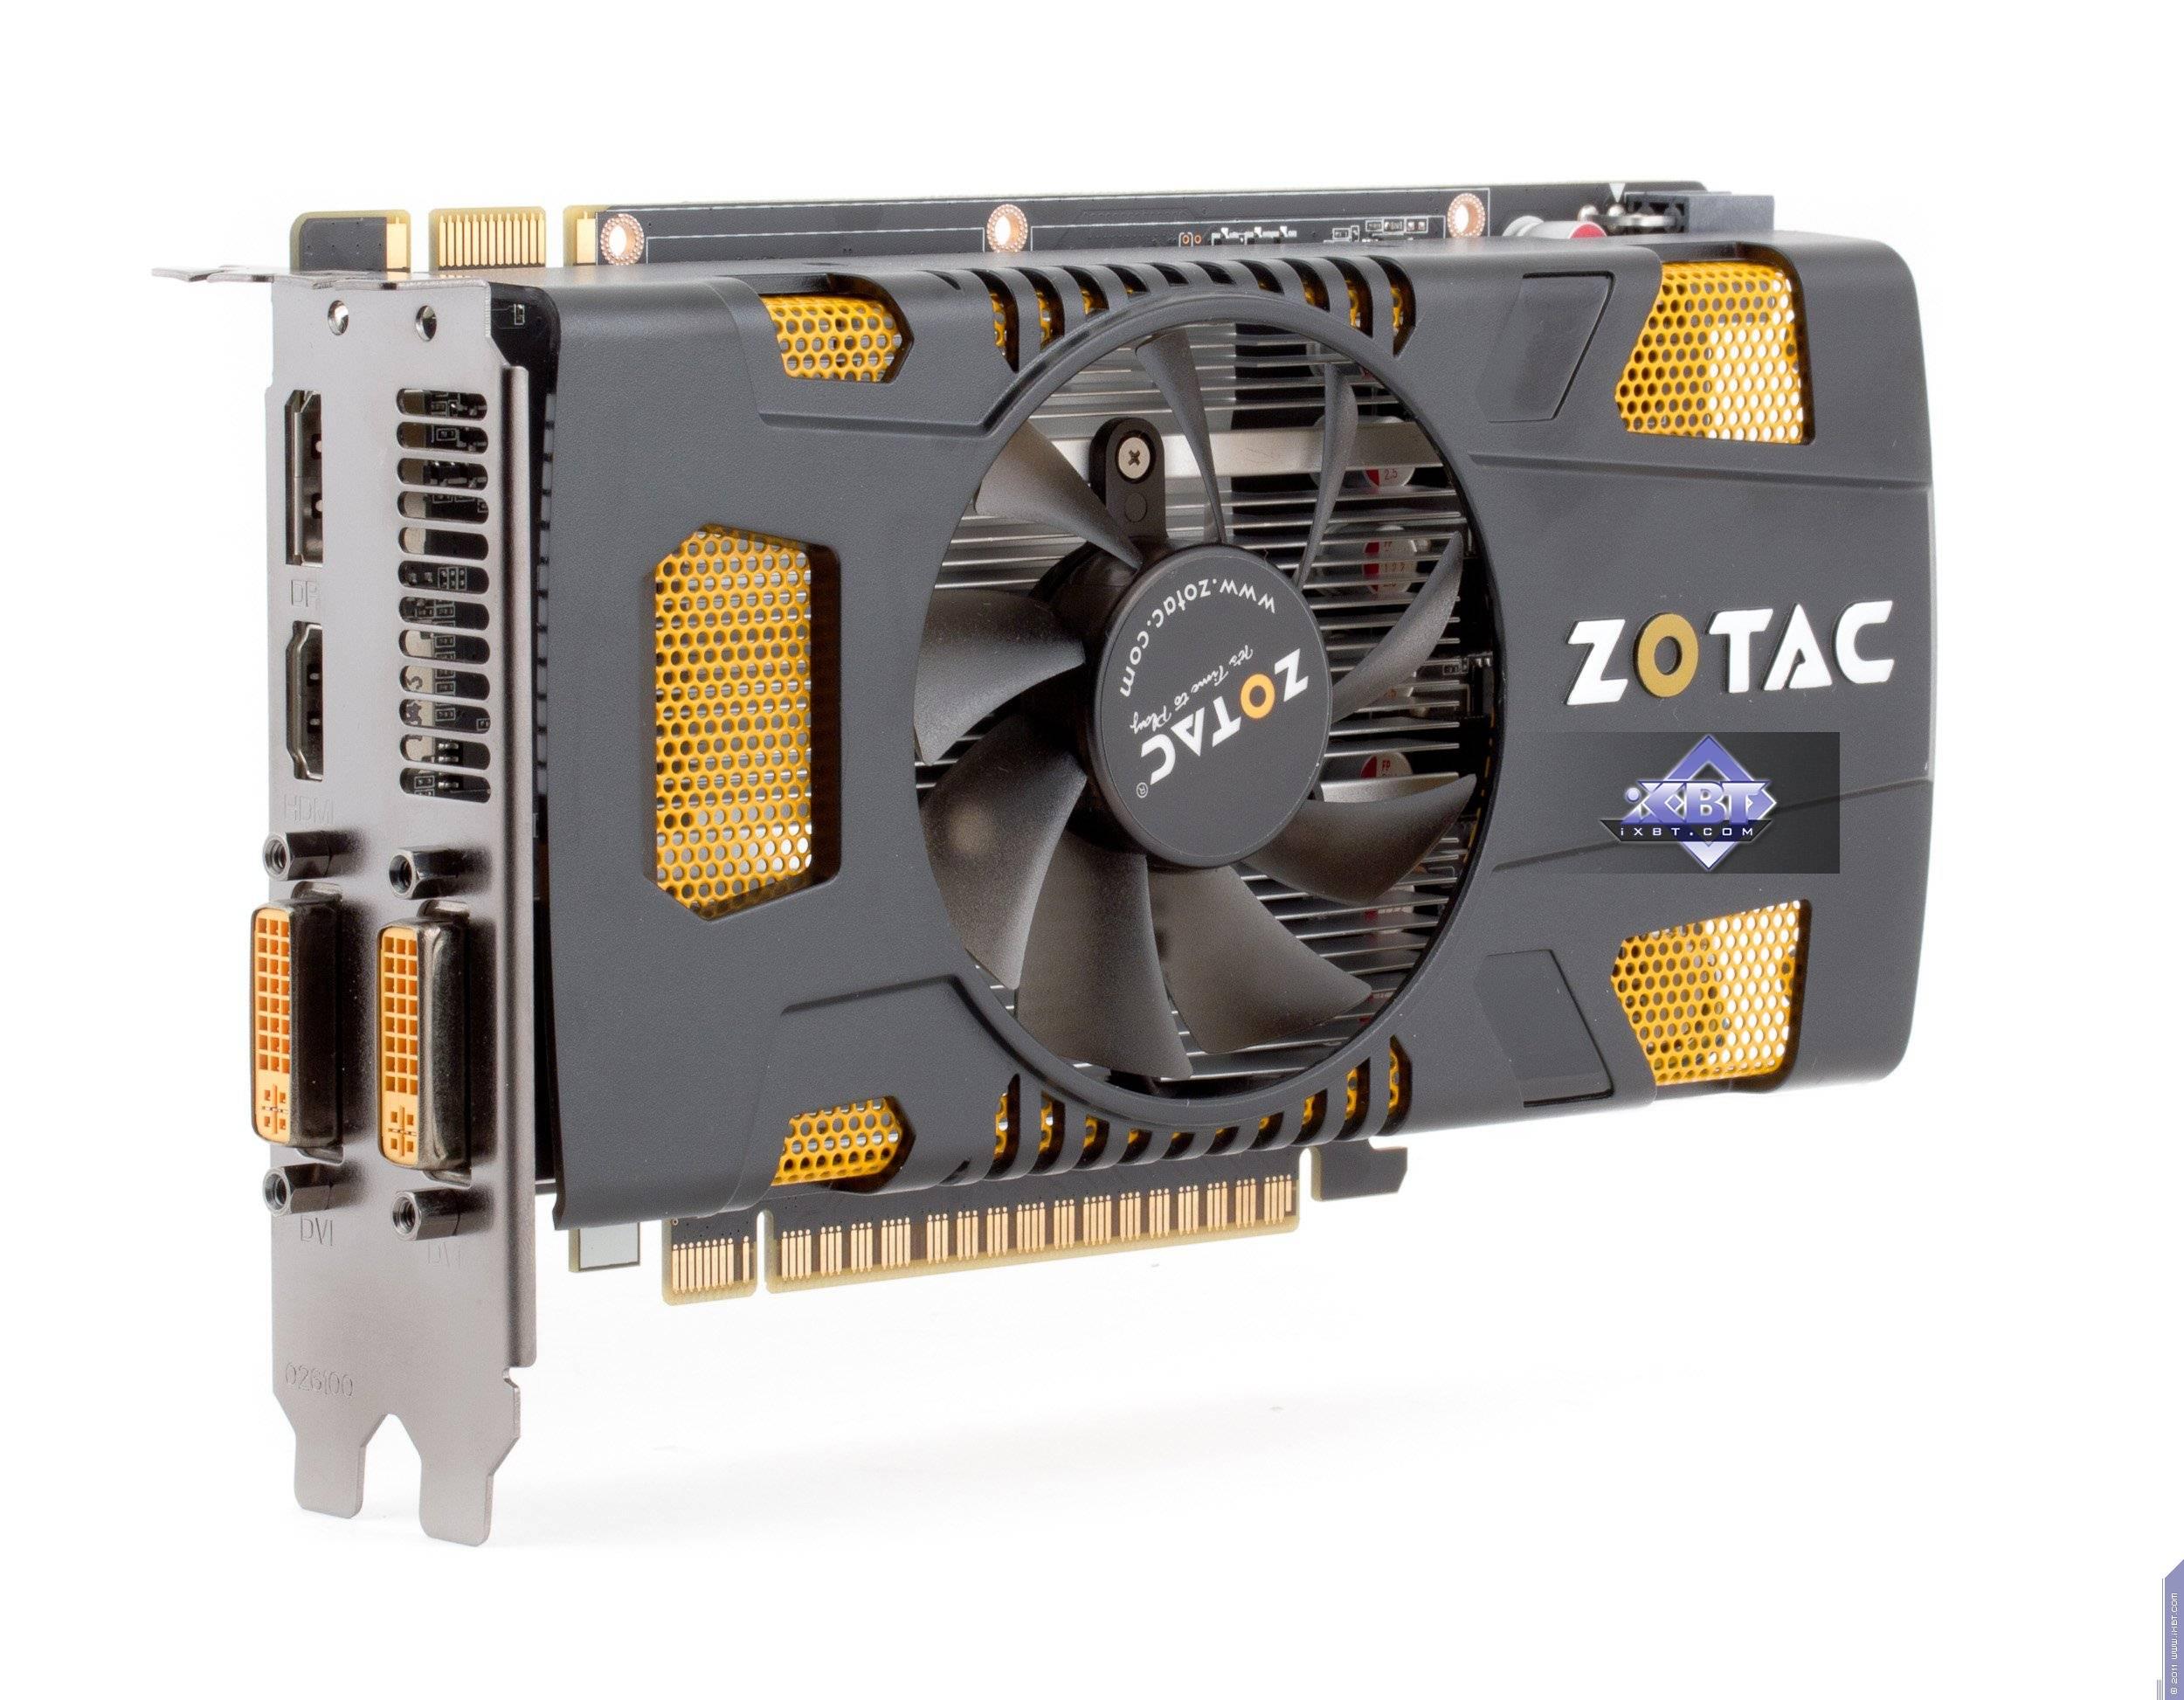 Zotac Geforce GTX 550 Ti драйвер